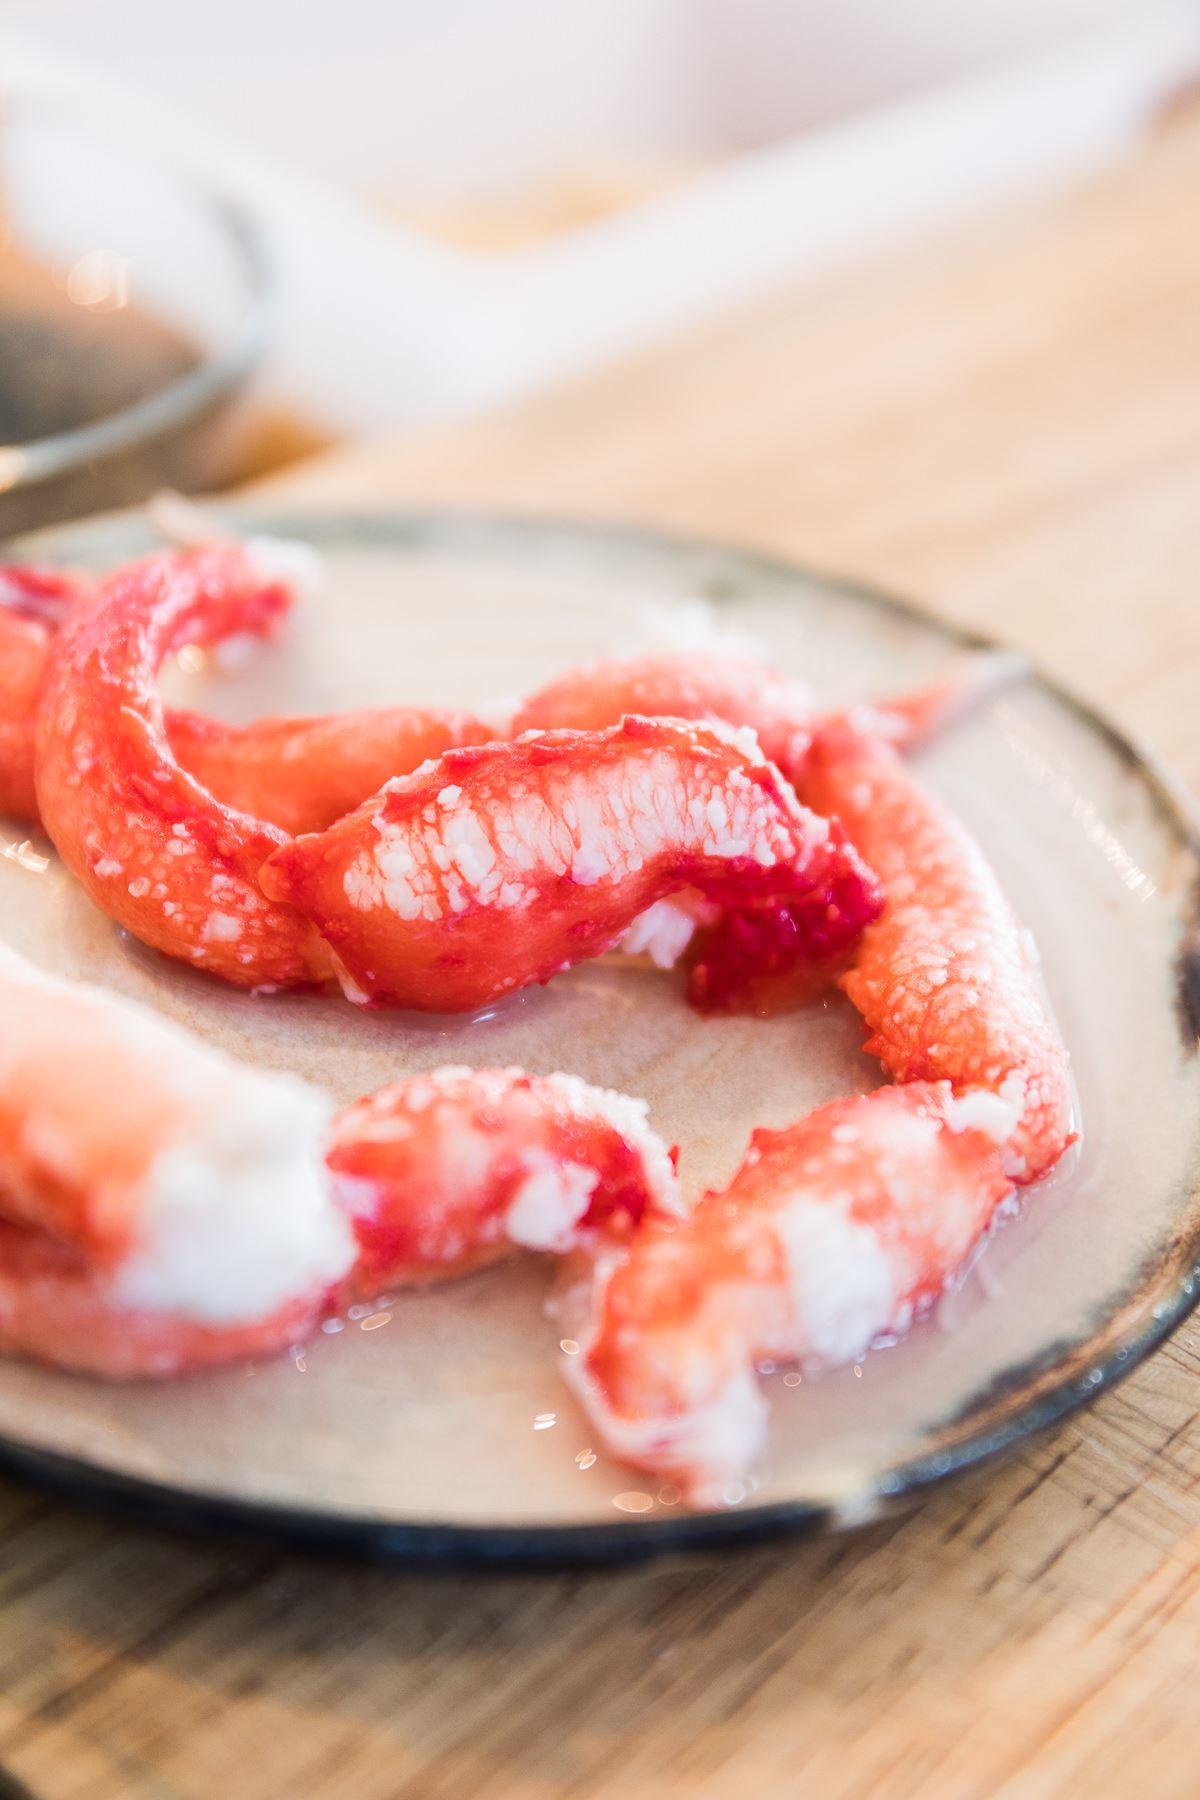 © Brice Portolano, Matkurs - Lofoten Food Studio